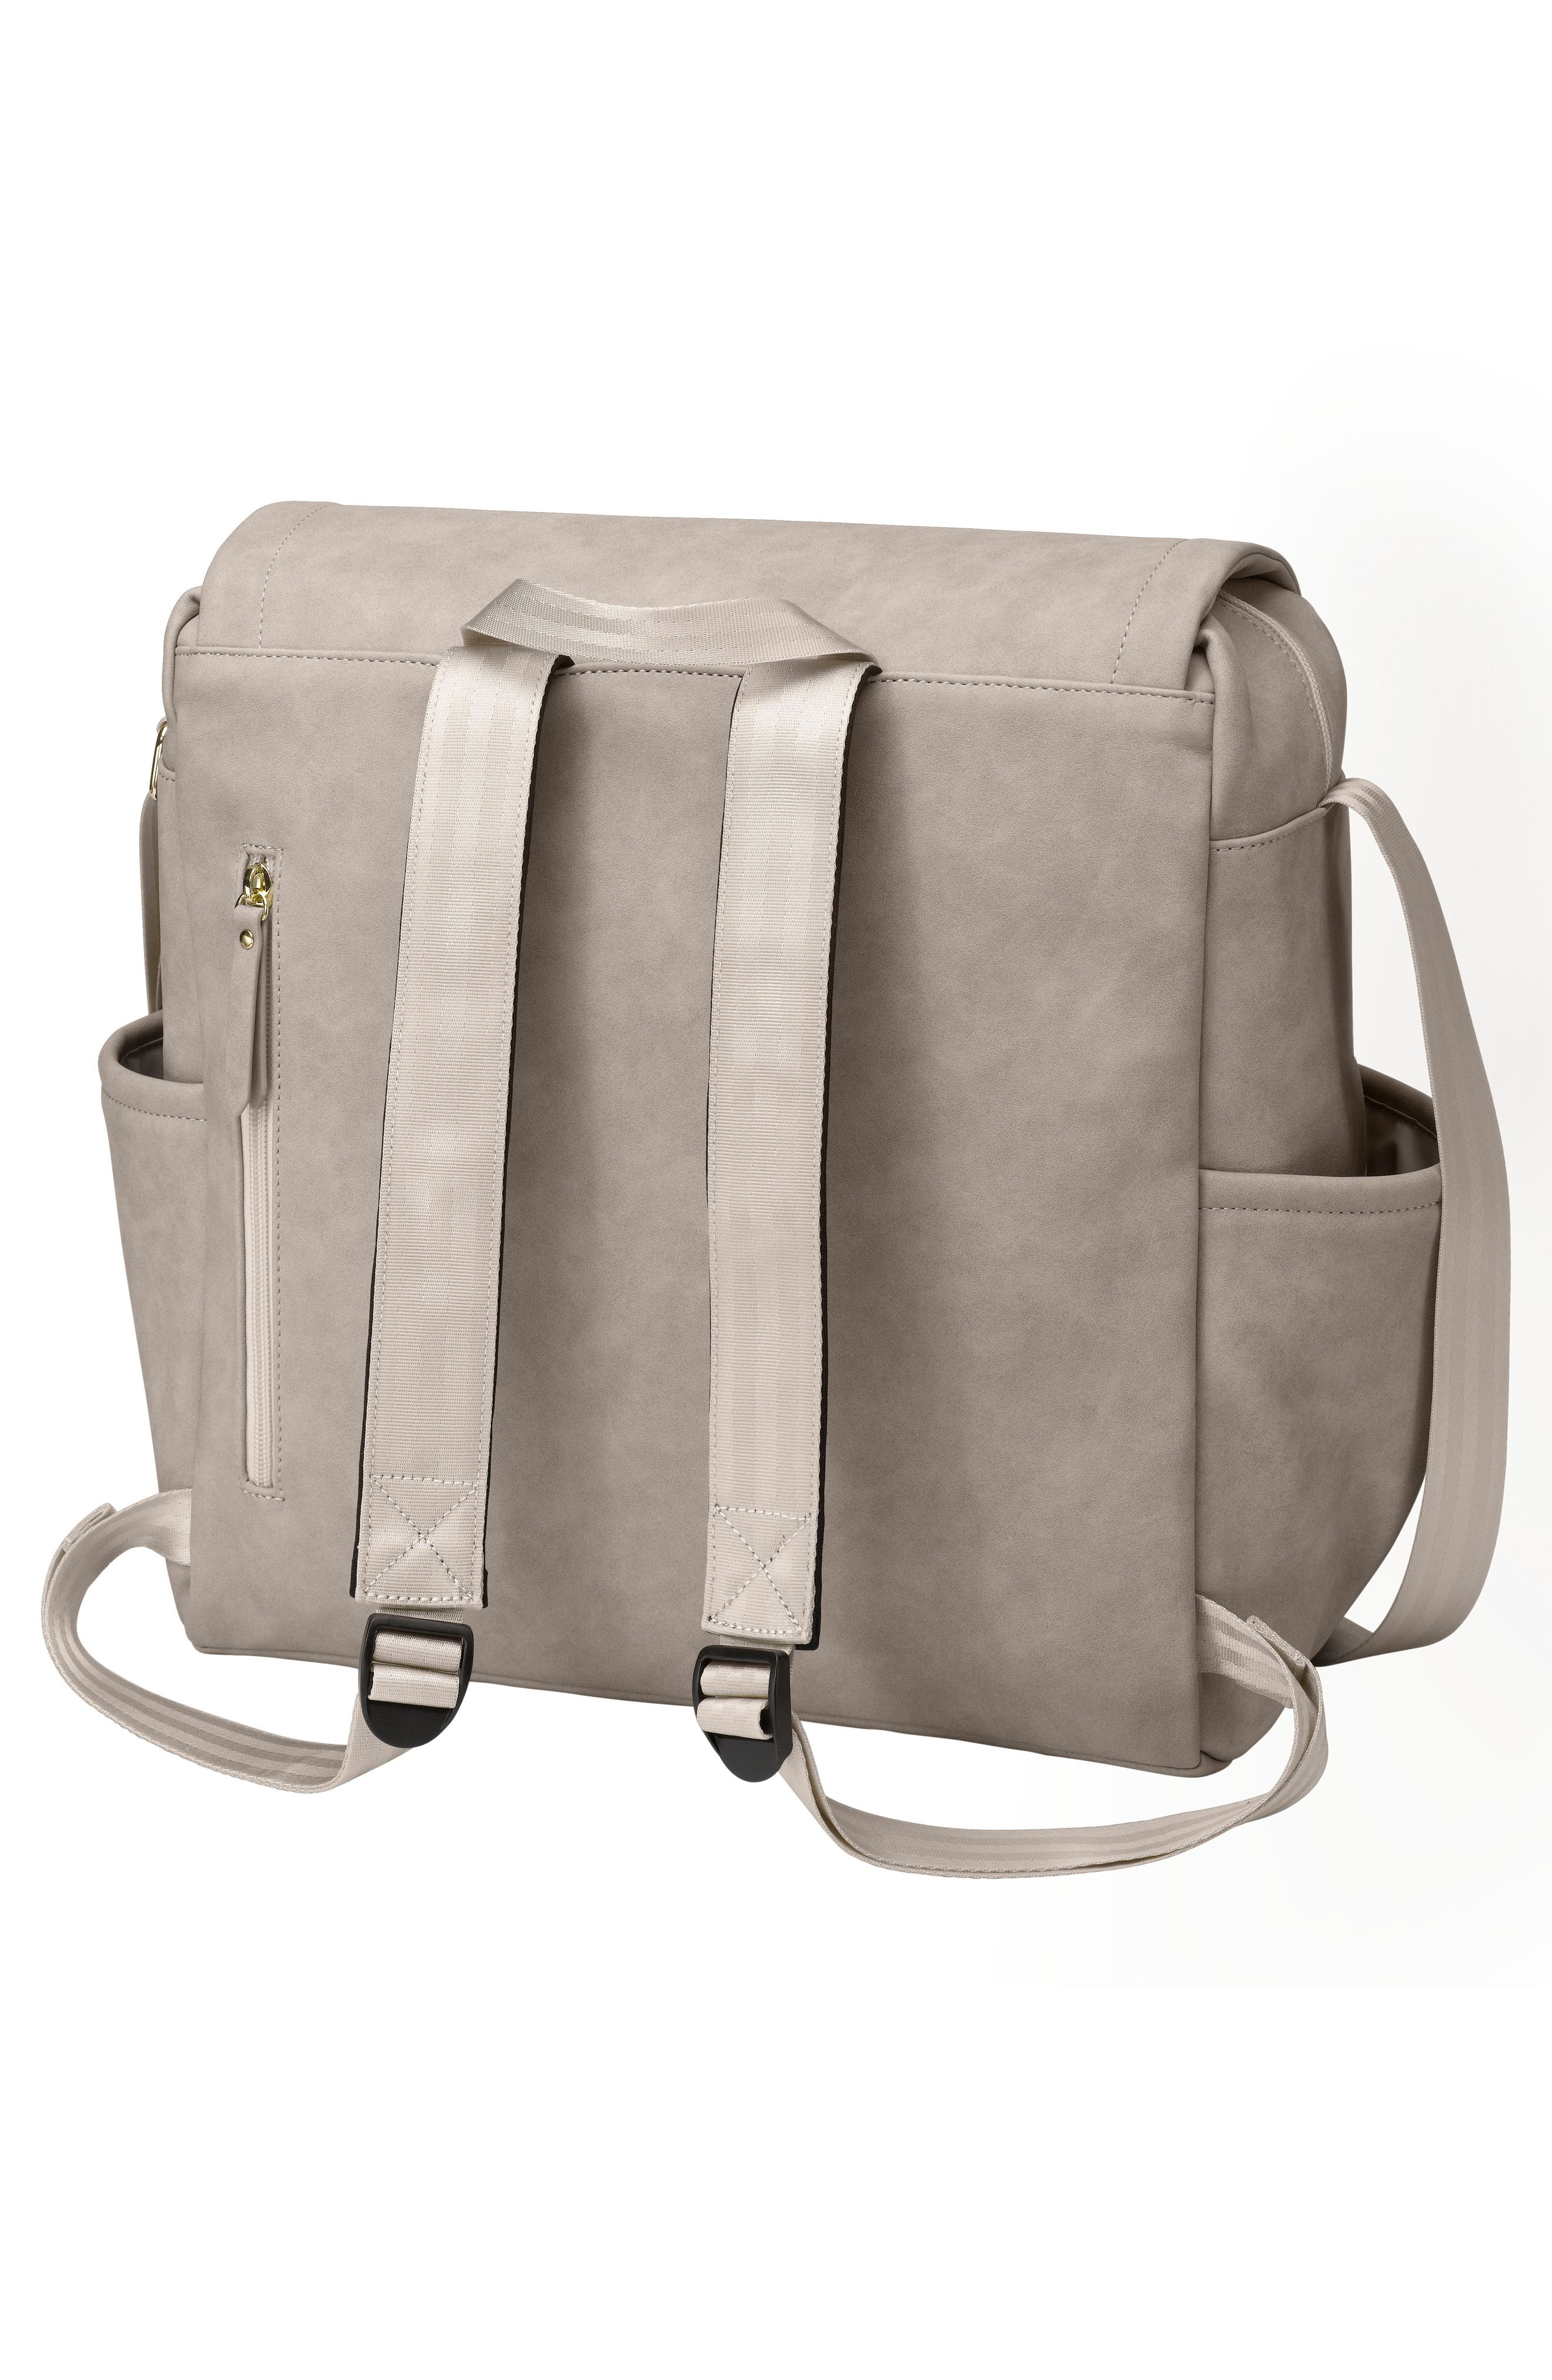 Boxy Backpack Diaper Bag,                             Alternate thumbnail 4, color,